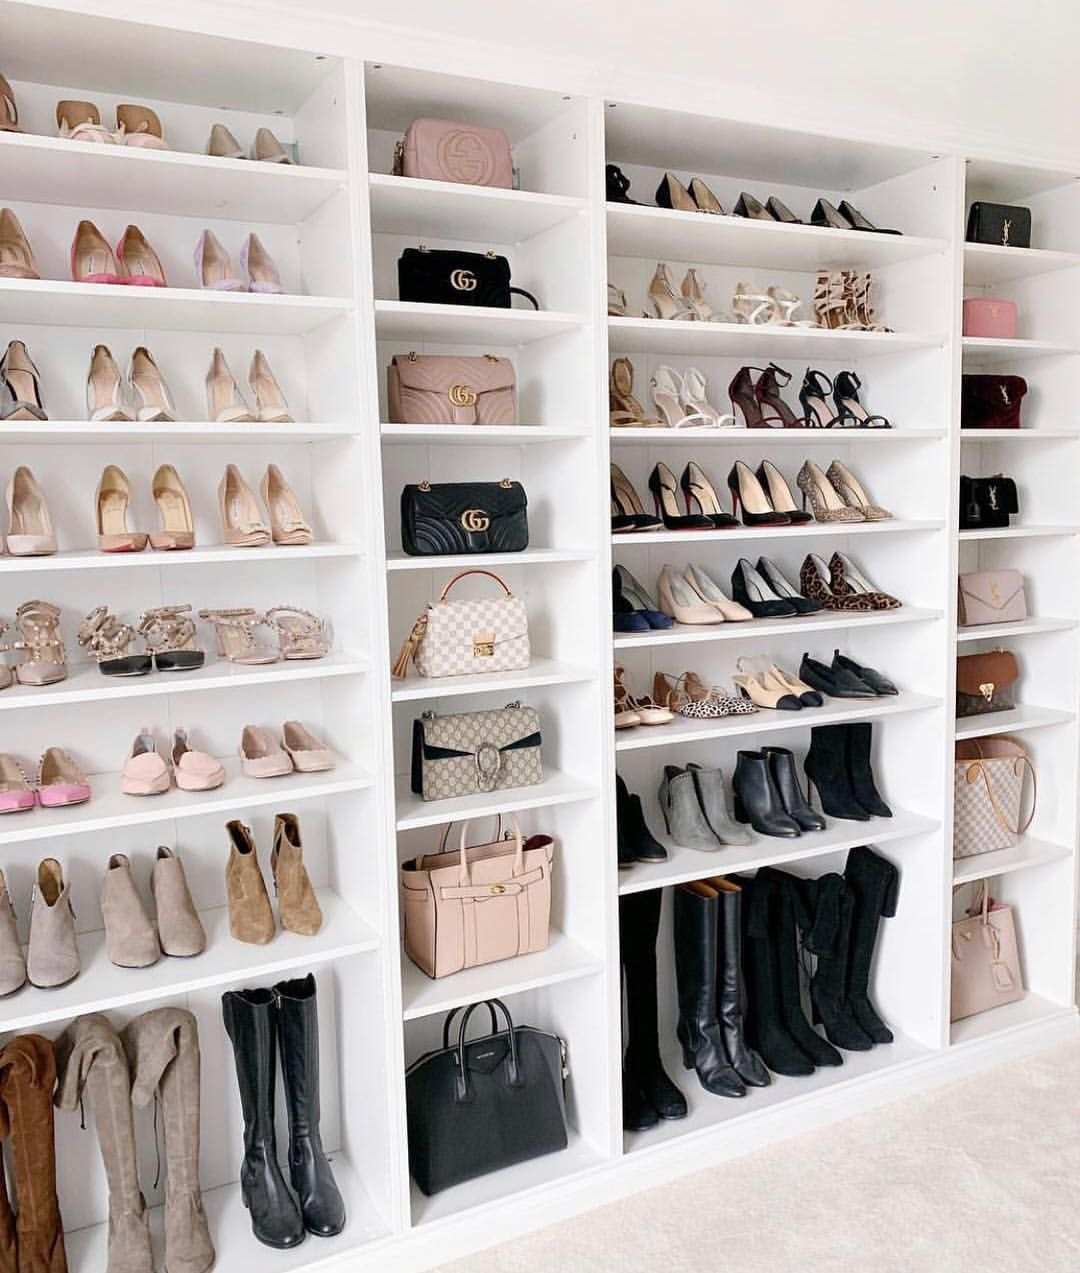 My Closet Closet Designs Closet Decor Walk In Closet Design